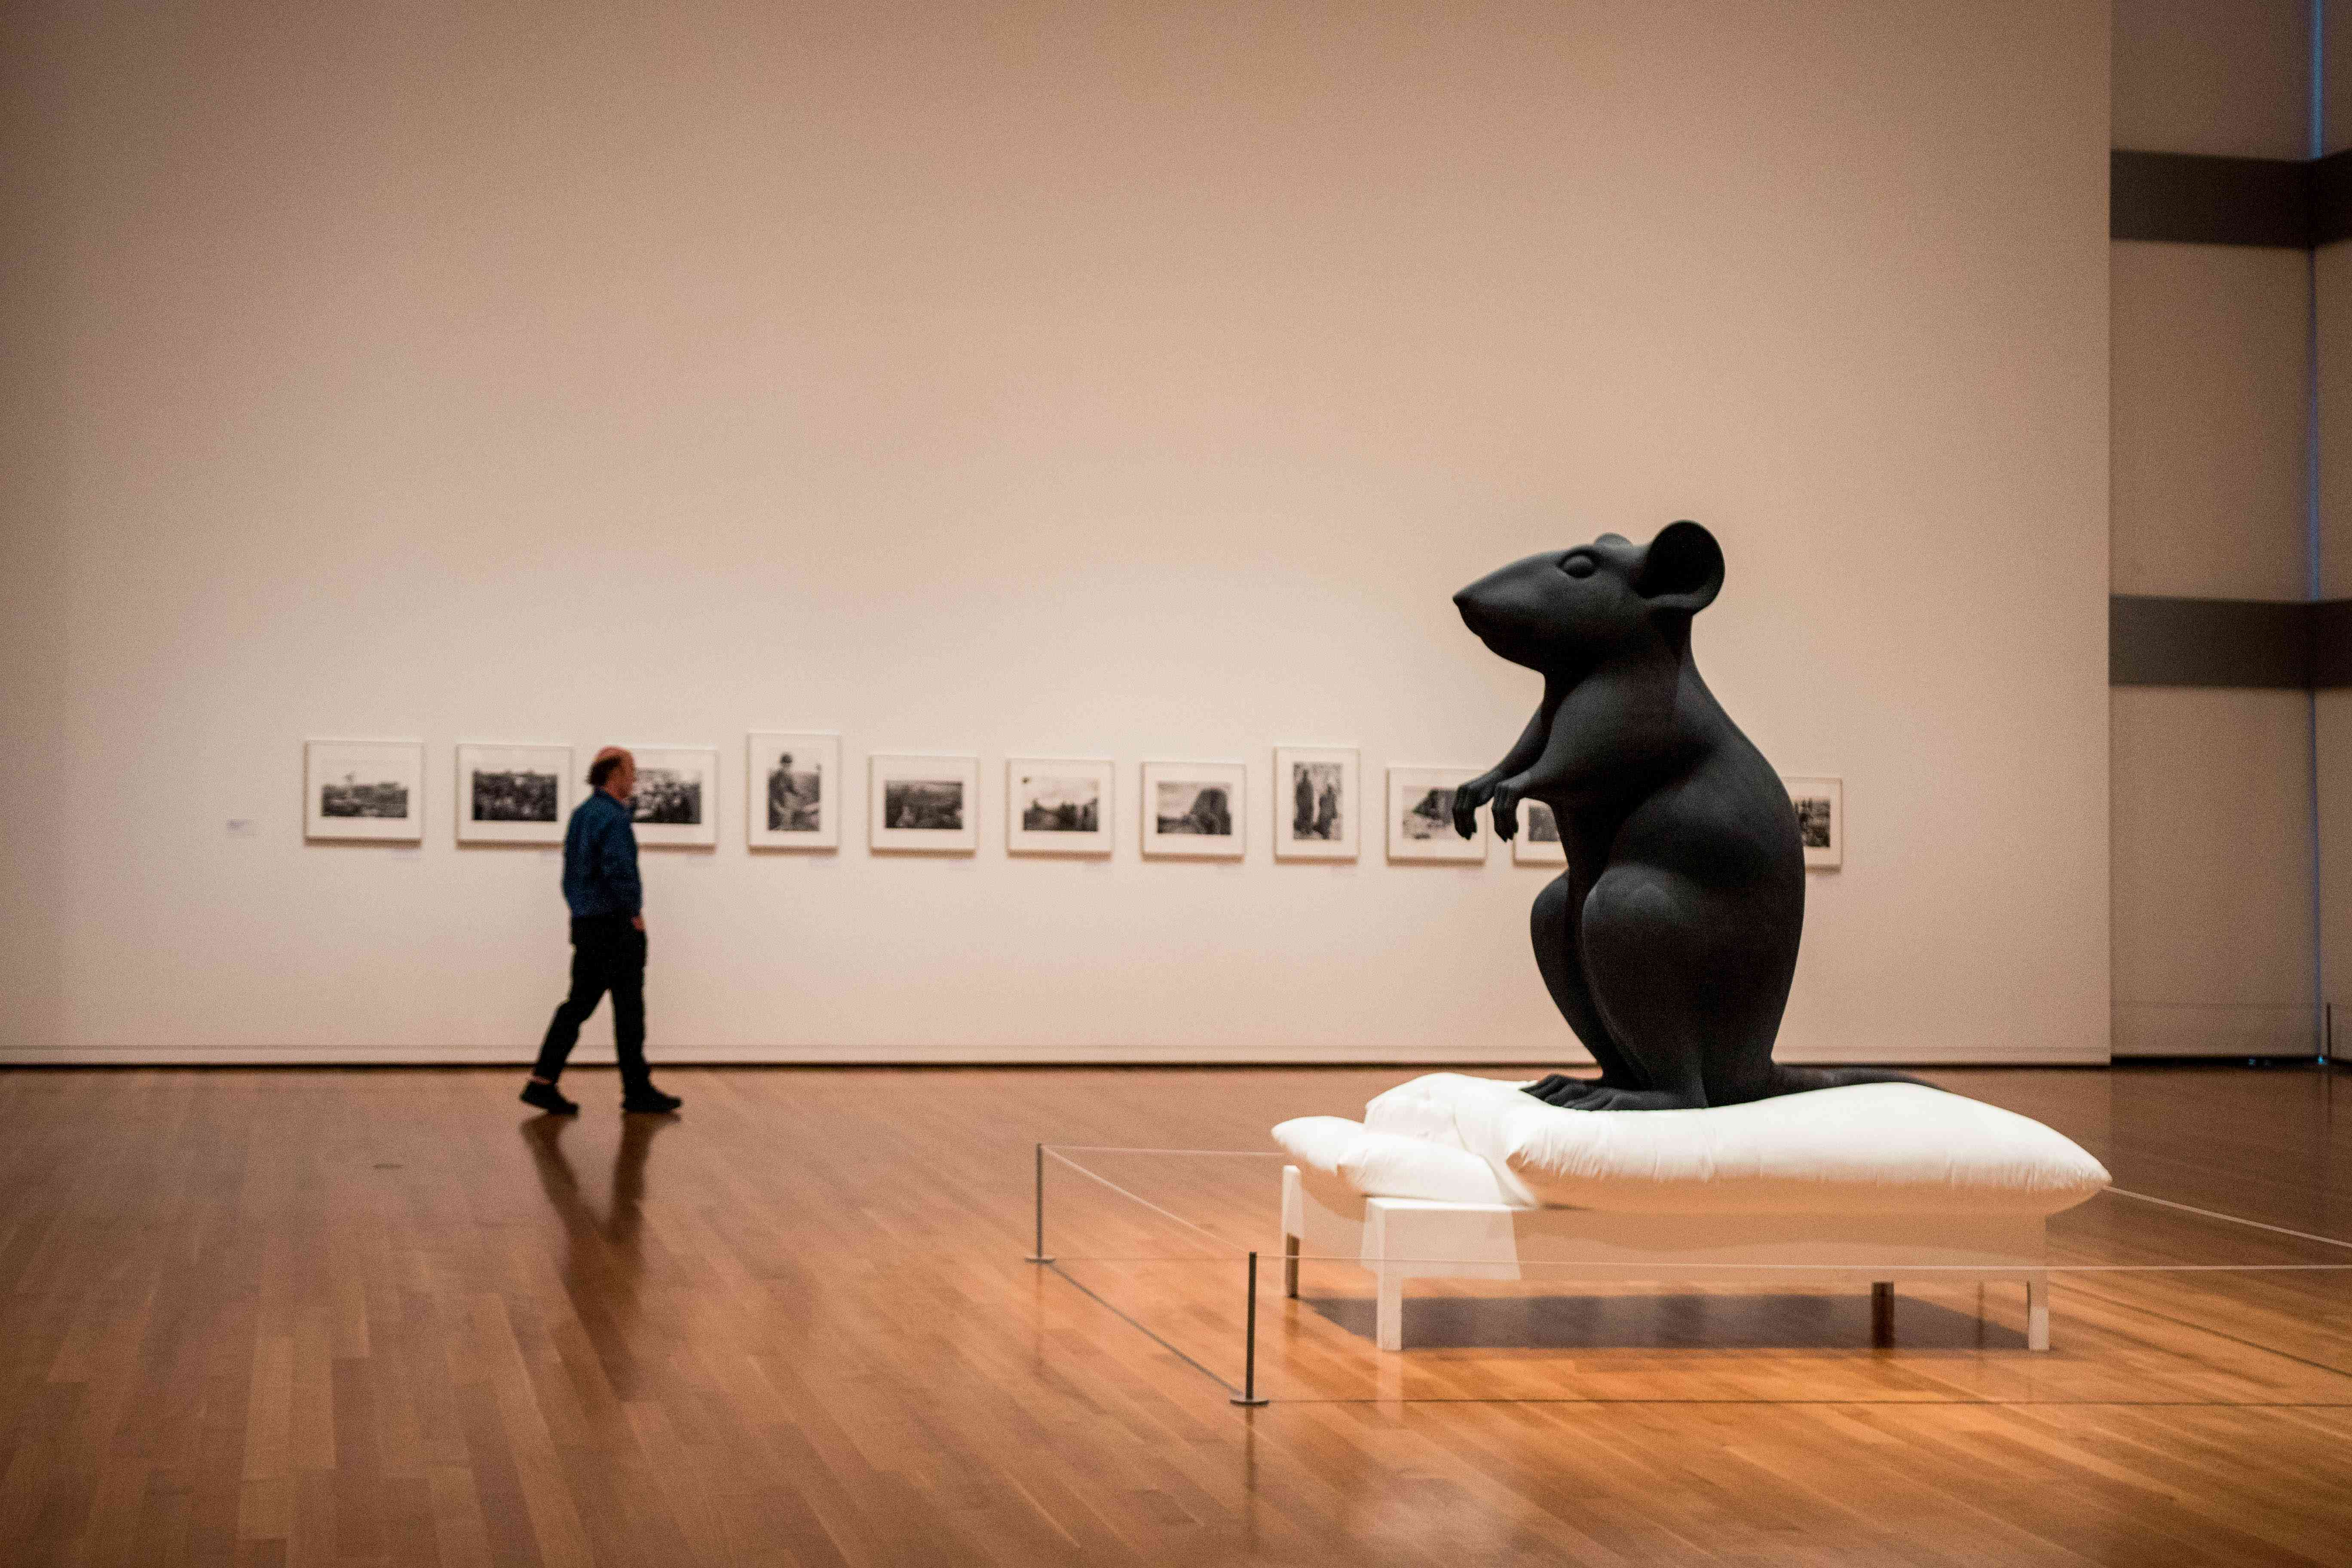 Seattle Art Museum in Washington state